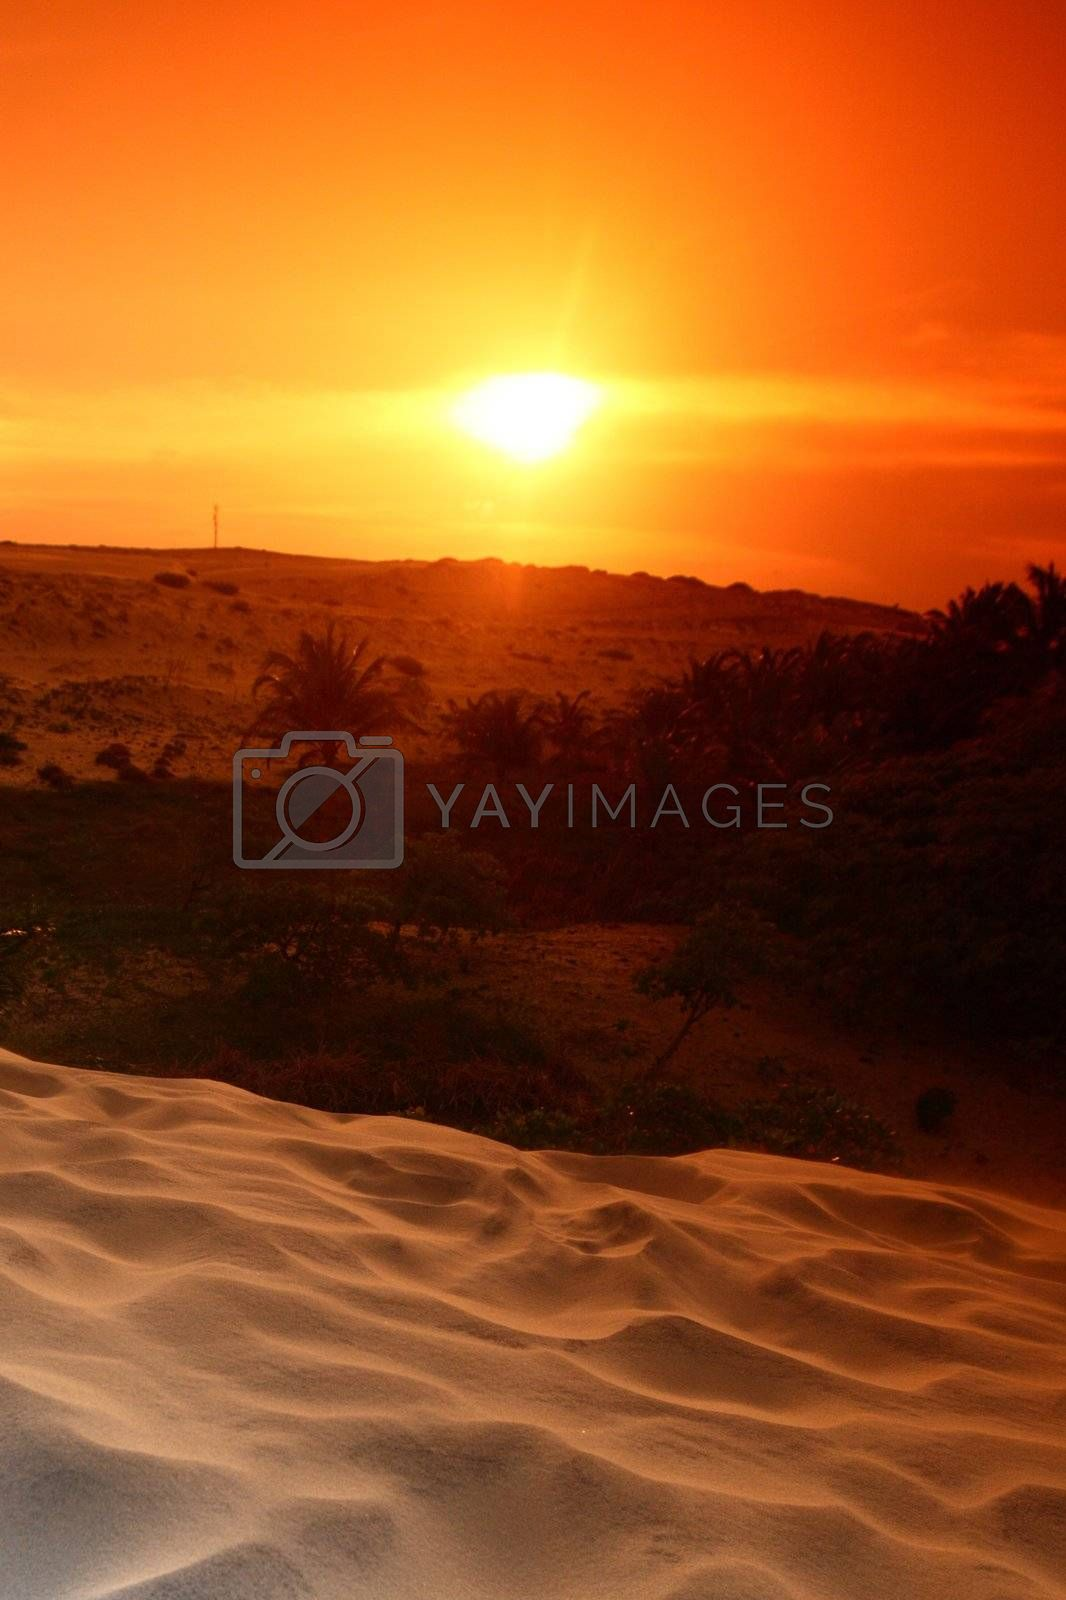 desert by Yellowj